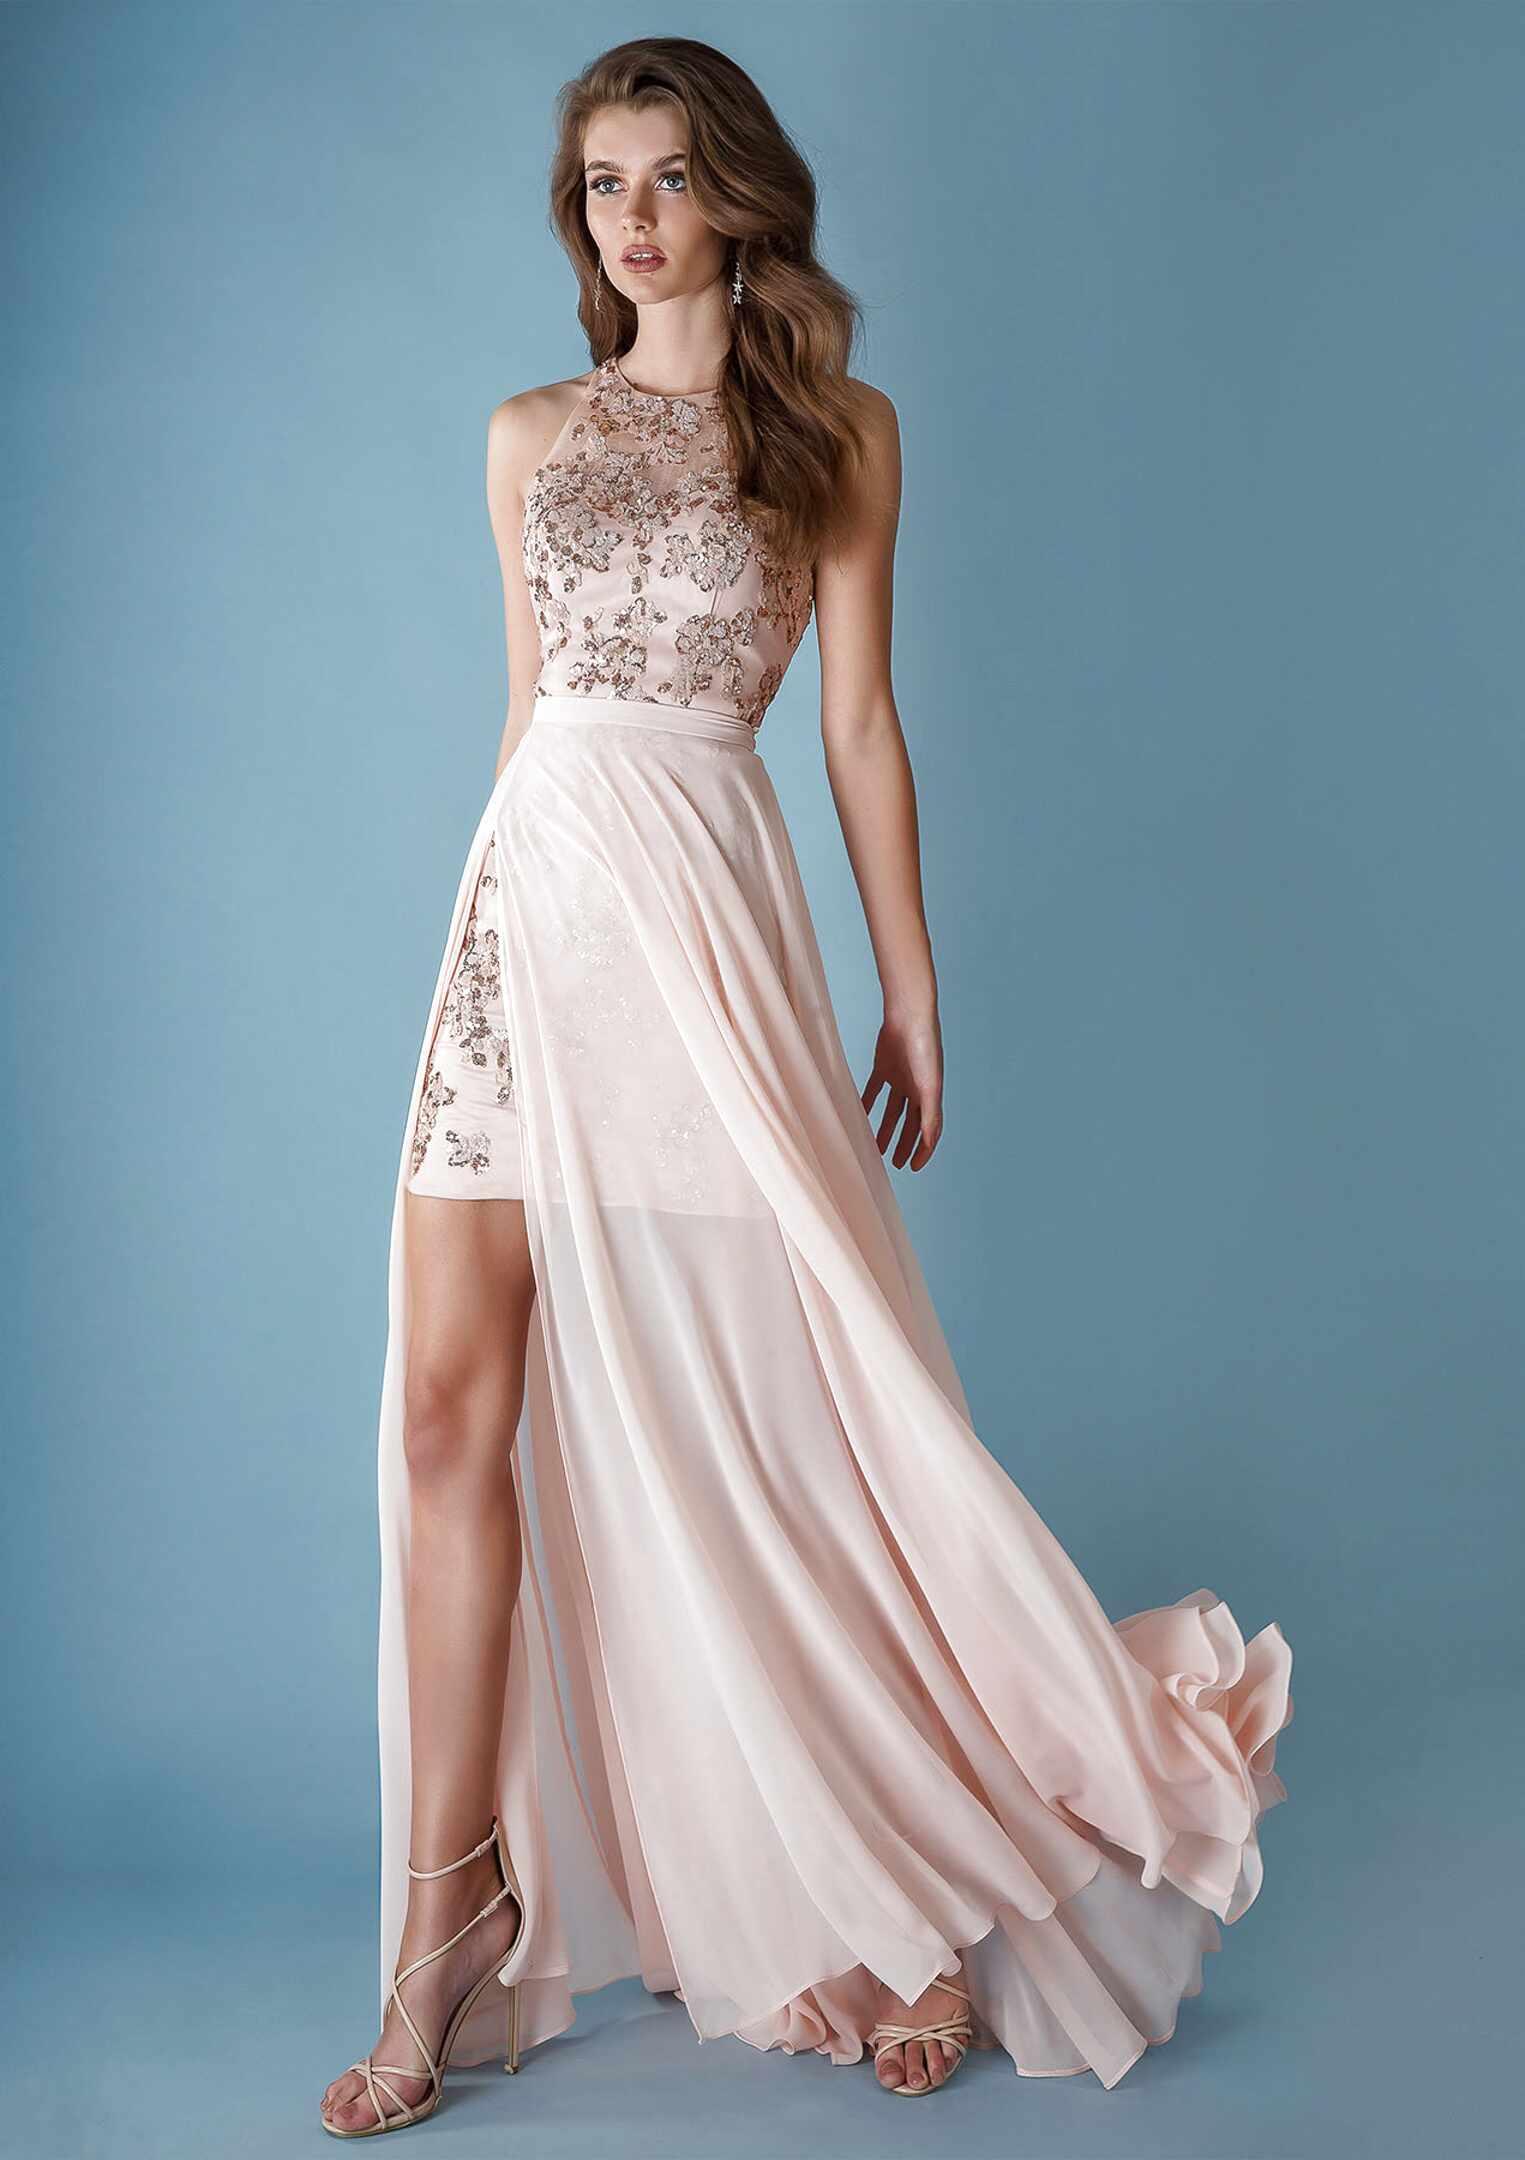 Vestiti Eleganti Donne.Vestiti Eleganti Donna Cerimonia Usato In Italia Vedi Tutte I 40